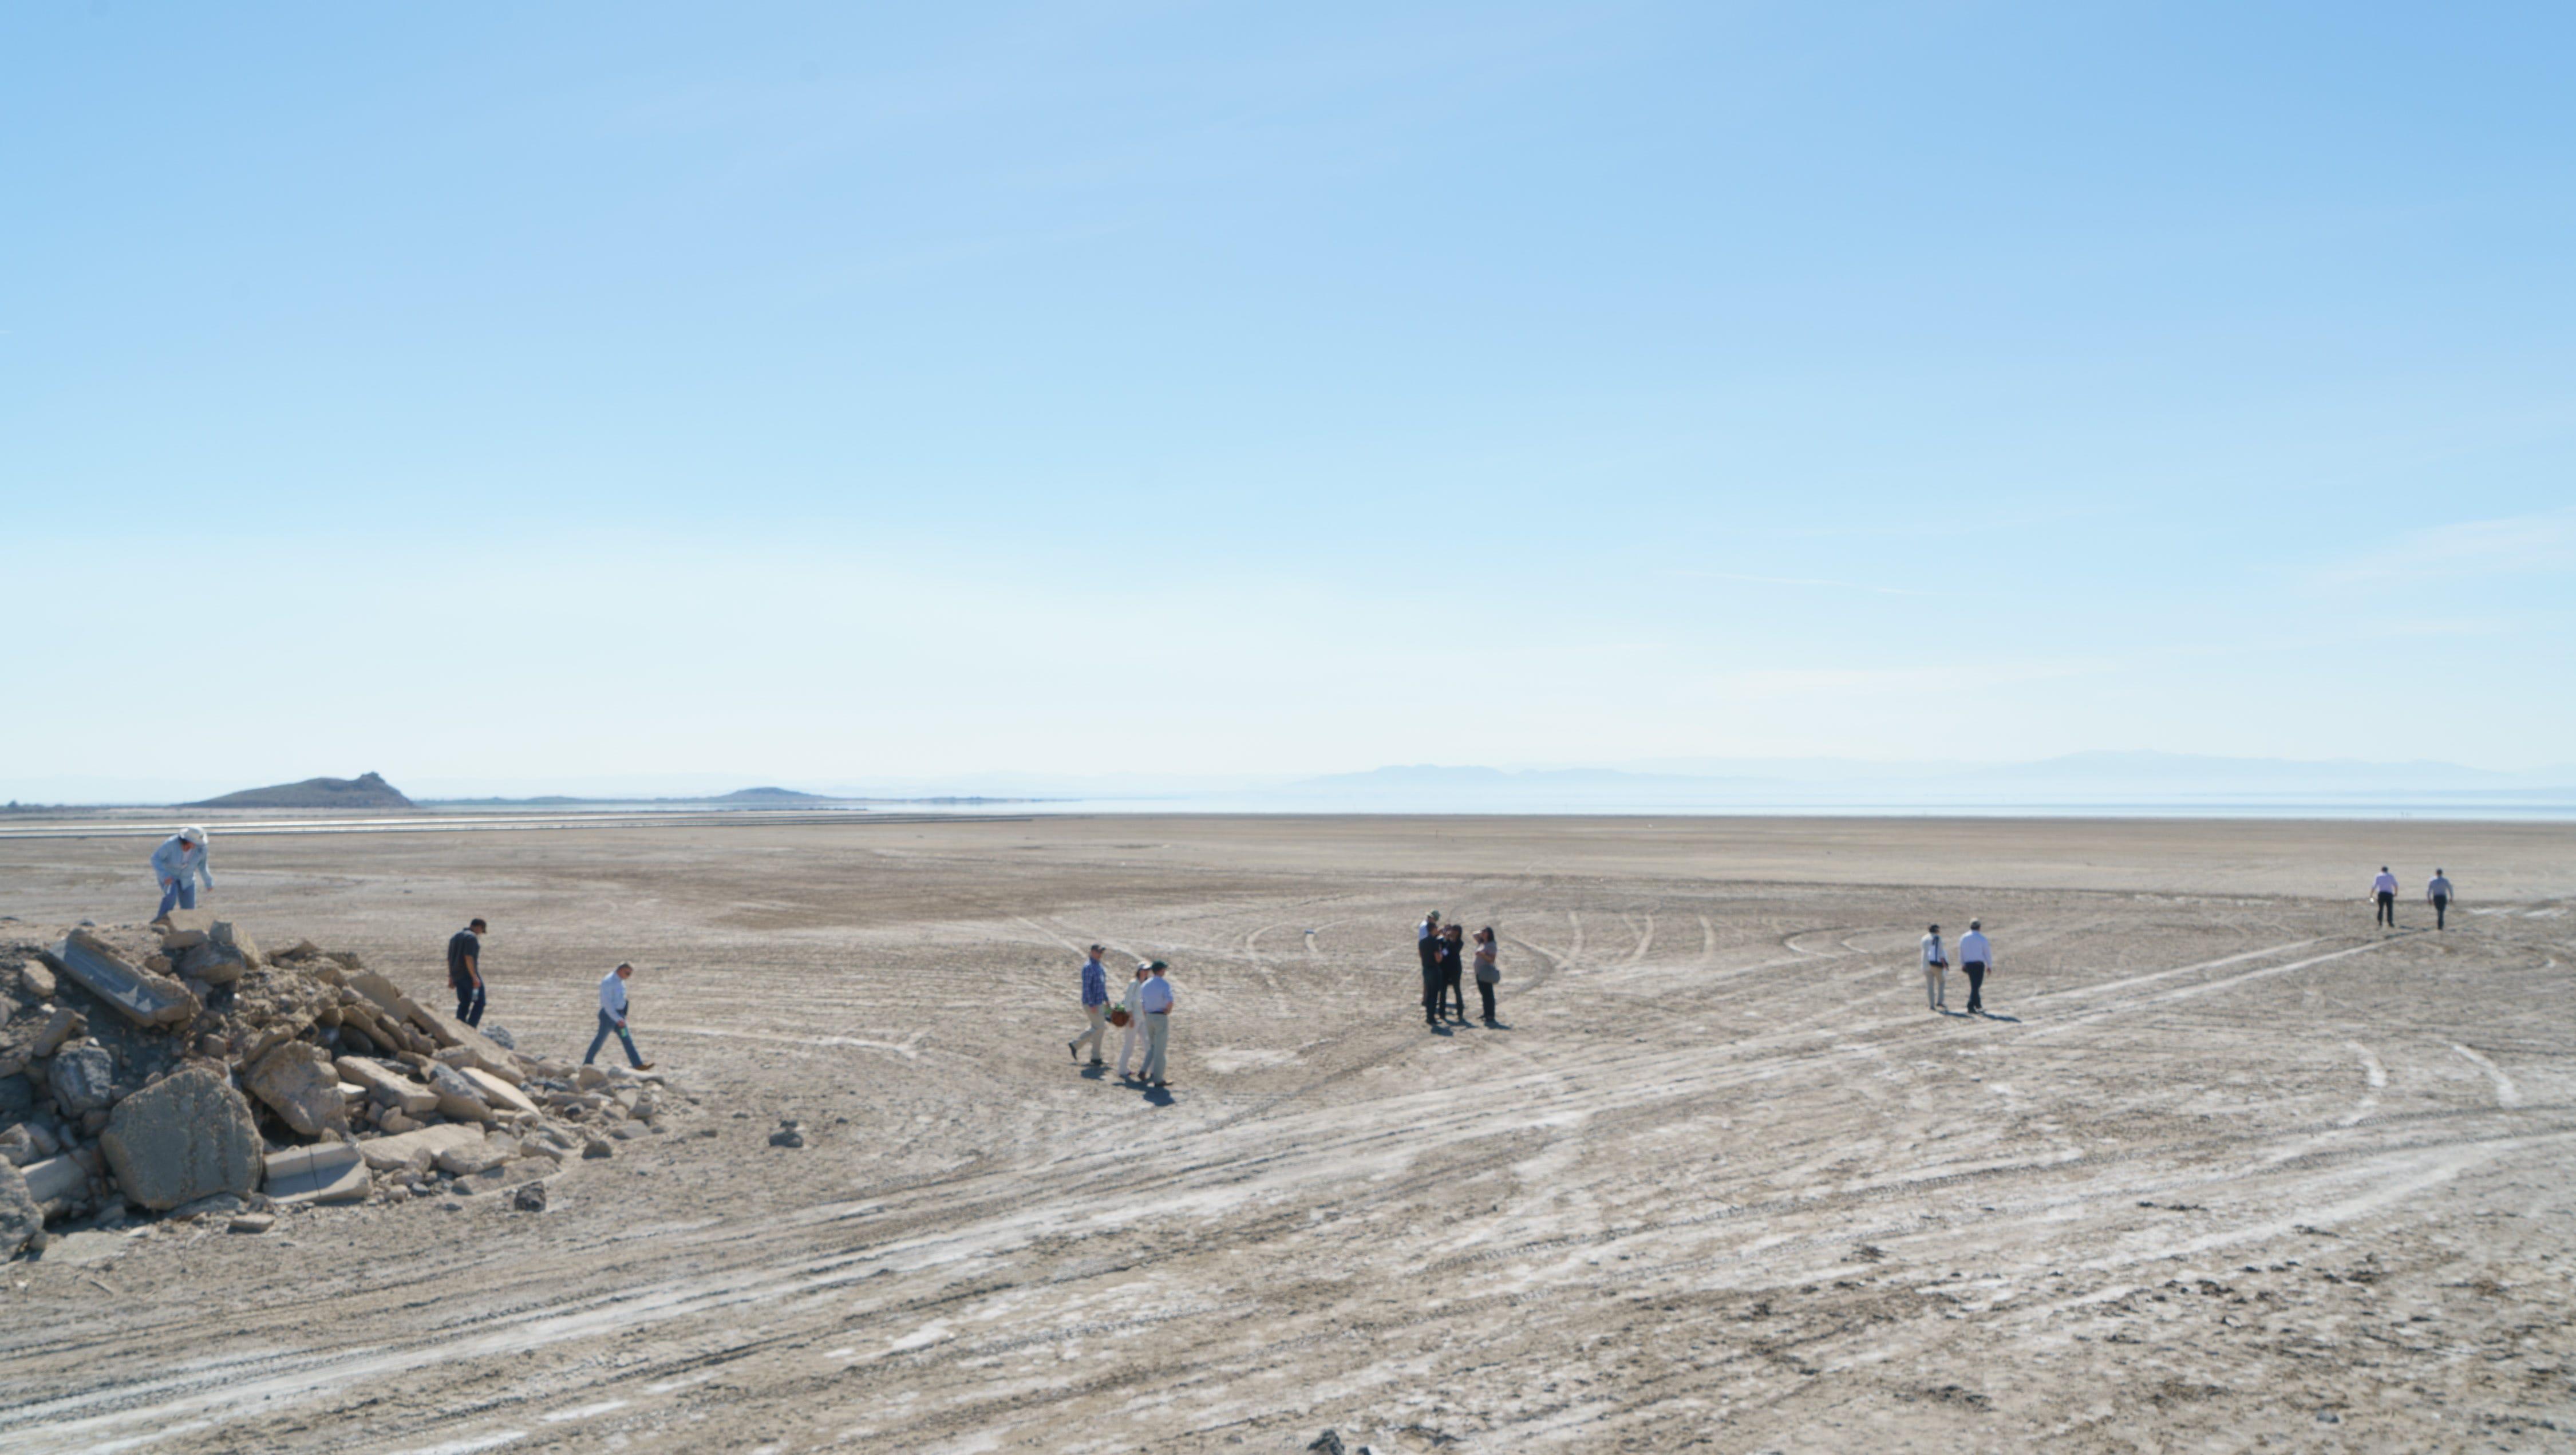 California's Dying Sea: Part 1: California far from solutions as Salton Sea crisis looms